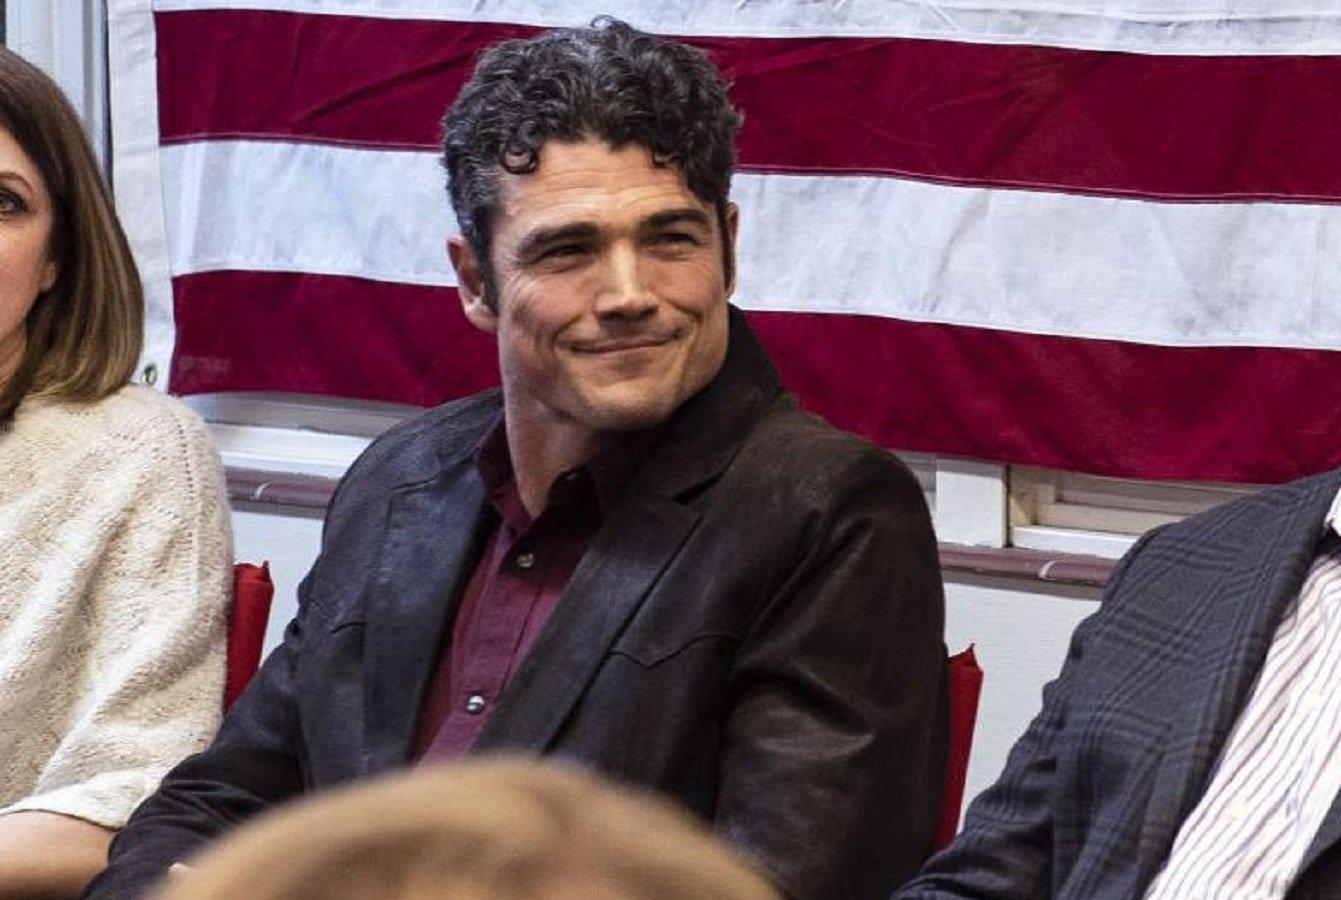 INTERVIEW: Meet Joe Kent, the Rockstar America First Candidate Seeking to Unseat Pro-Impeachment Rep. Jaime Herrera Beutler